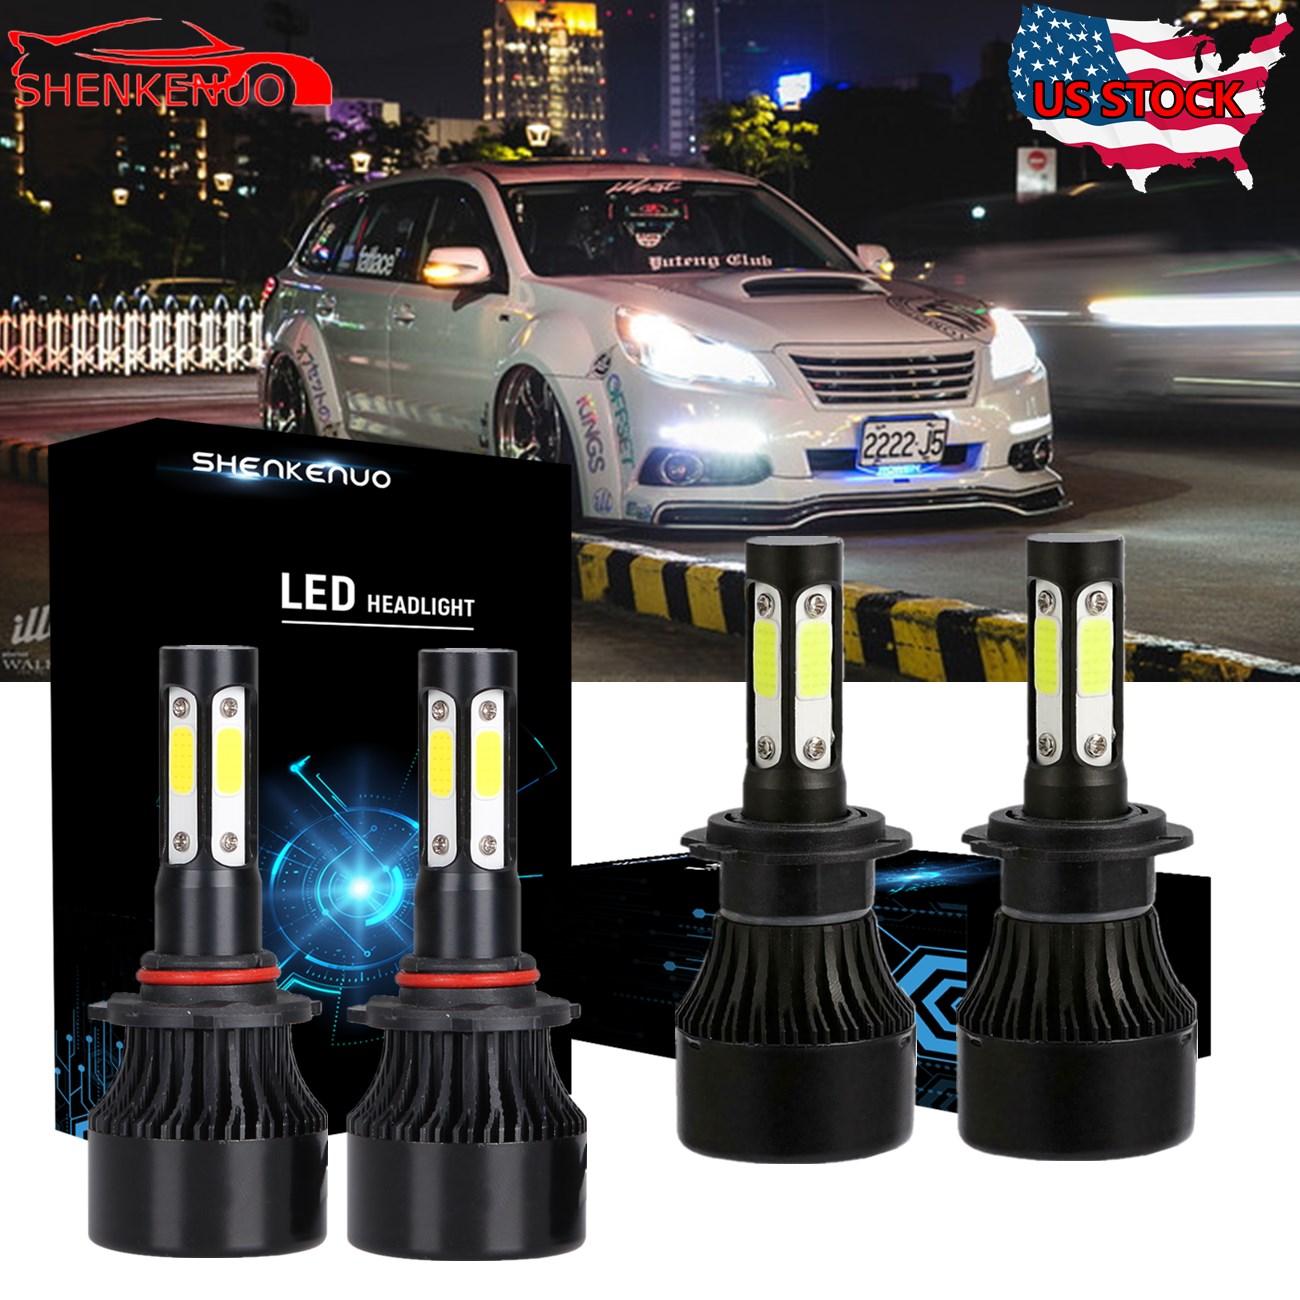 LED Headlight Kit Protekz Bulb H7 6K CREE Low Beam for 2005-2014 SUBARU LEGACY